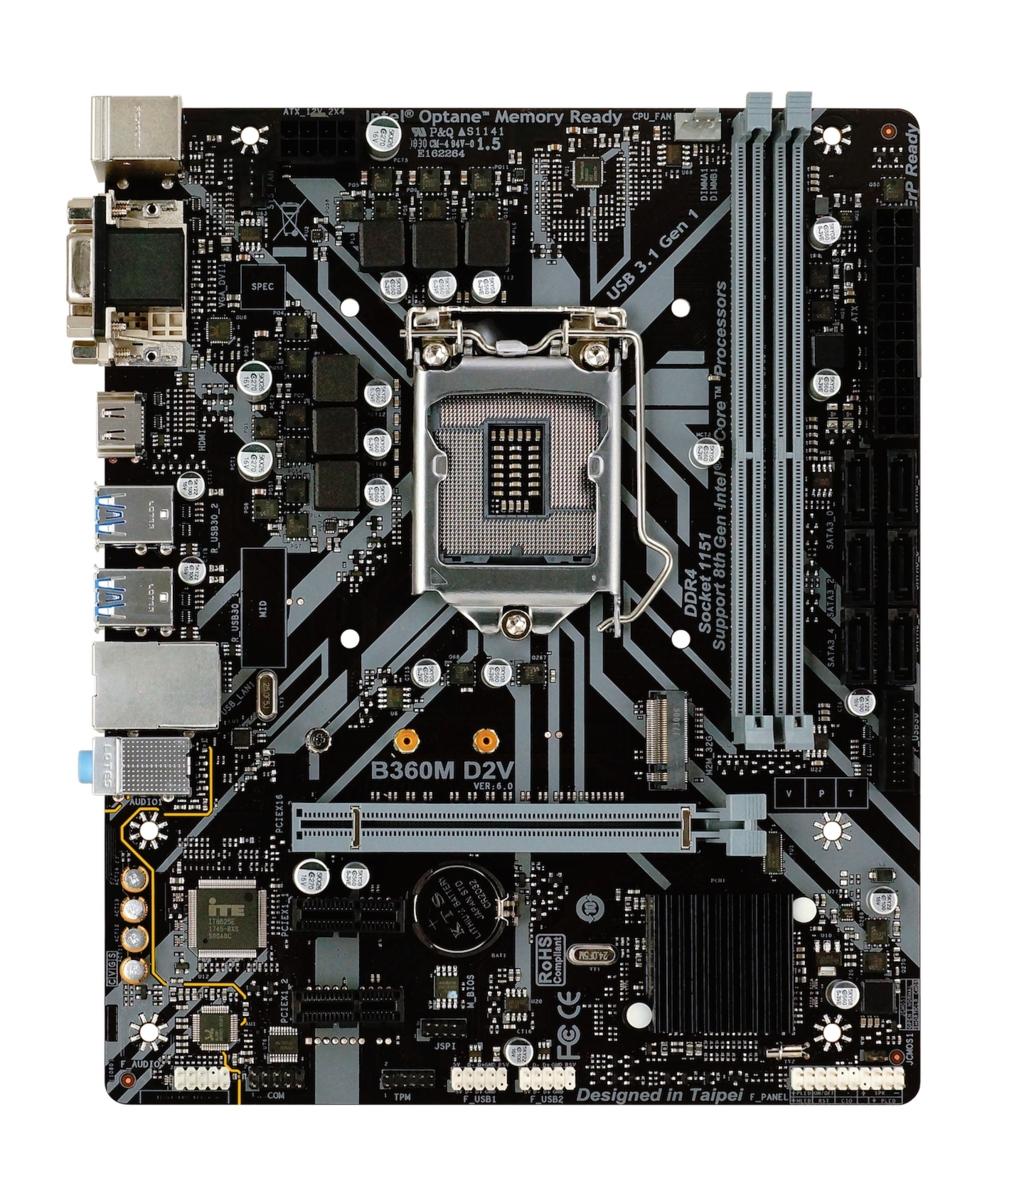 Biostar B360M D2V - Intel - LGA 1151 (Socket H4) - Intel® Celeron® - Intel® Core™ i3 - Intel Core i5 - Intel Core i7 - Intel Core i9 - Intel® Pentium® - LGA 1151 (Socket H4) - DDR4-SDRAM - DIMM